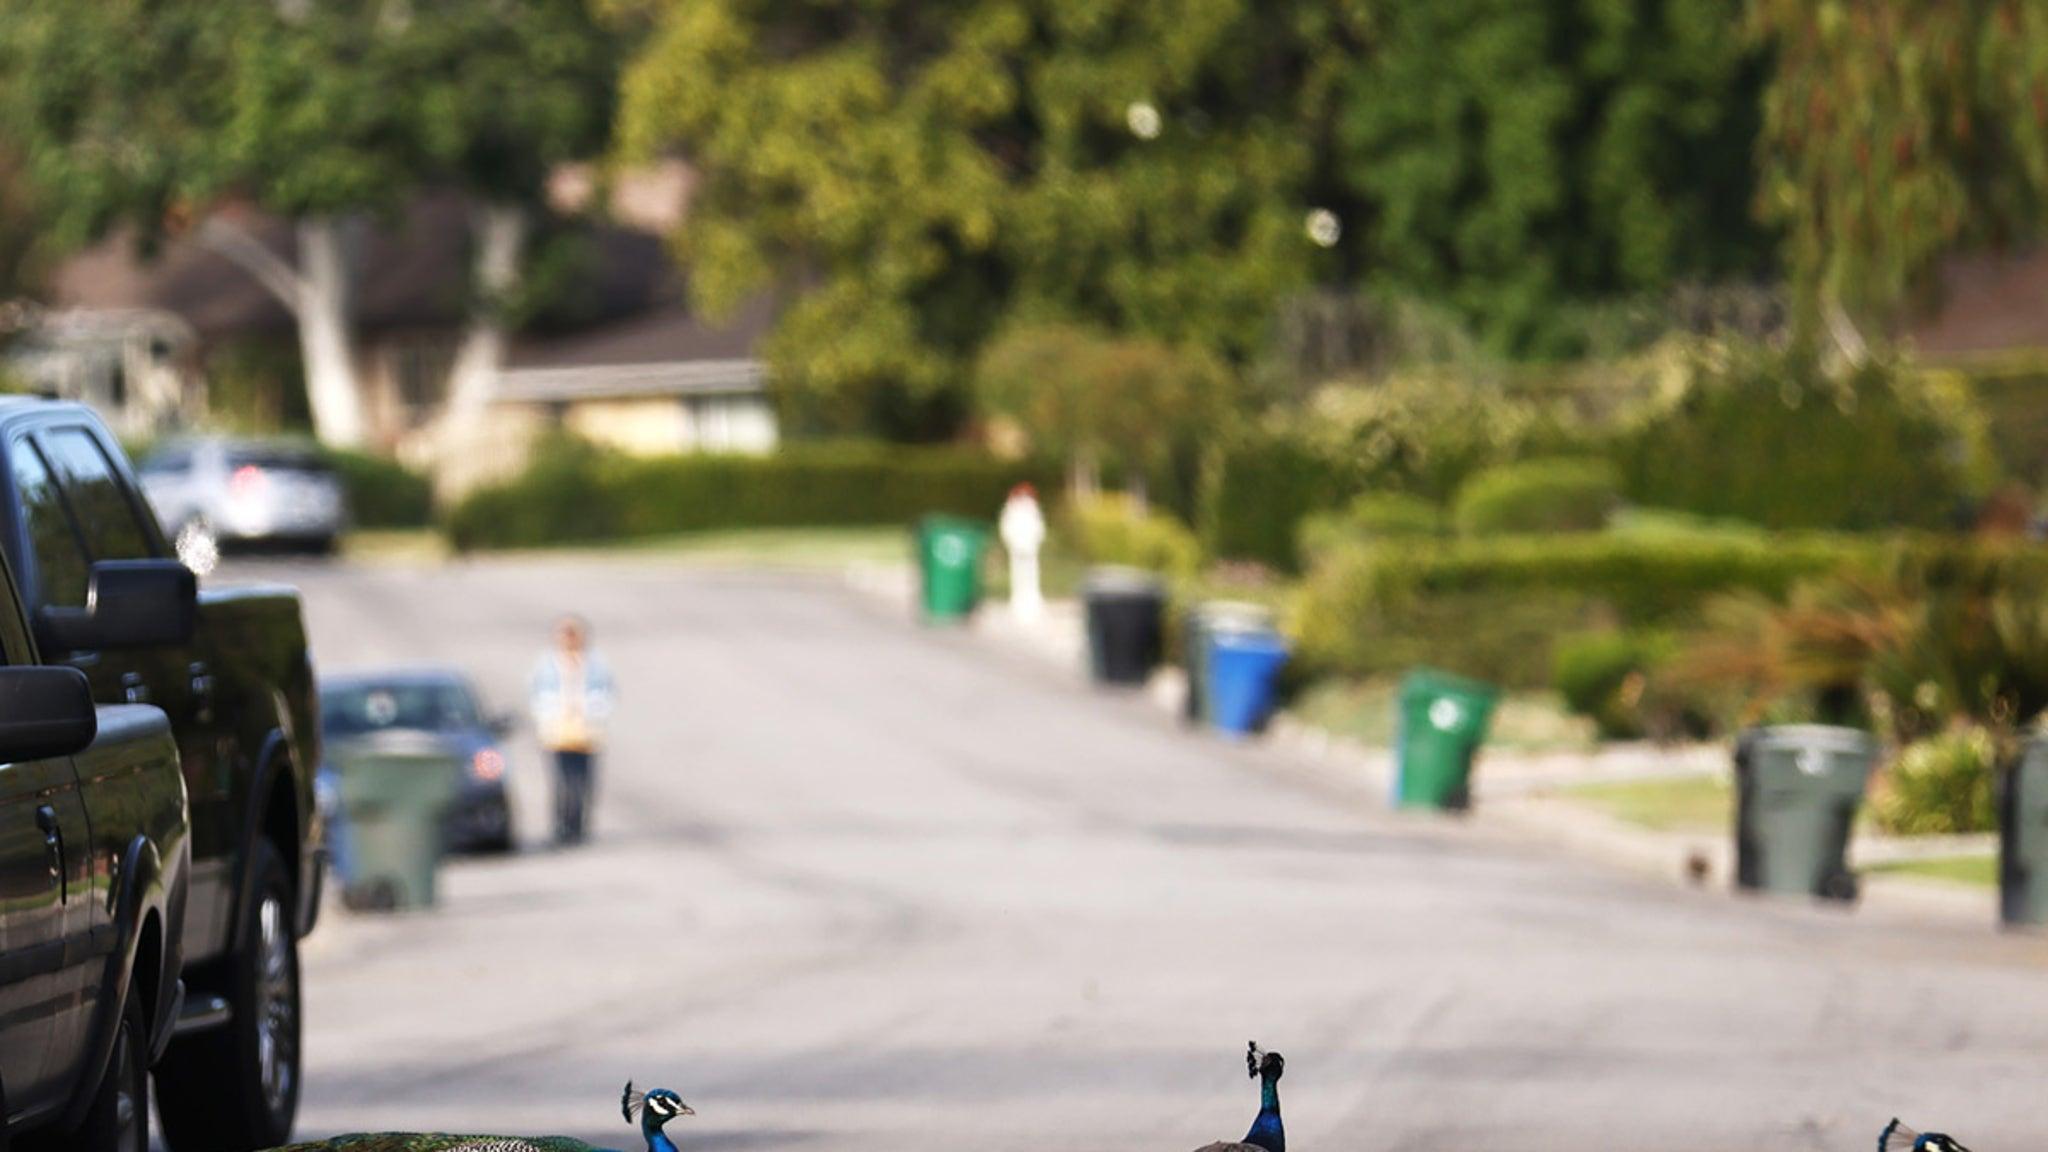 Peacocks Causing Major Problems in L.A. Towns, Their Version of Cicadas thumbnail